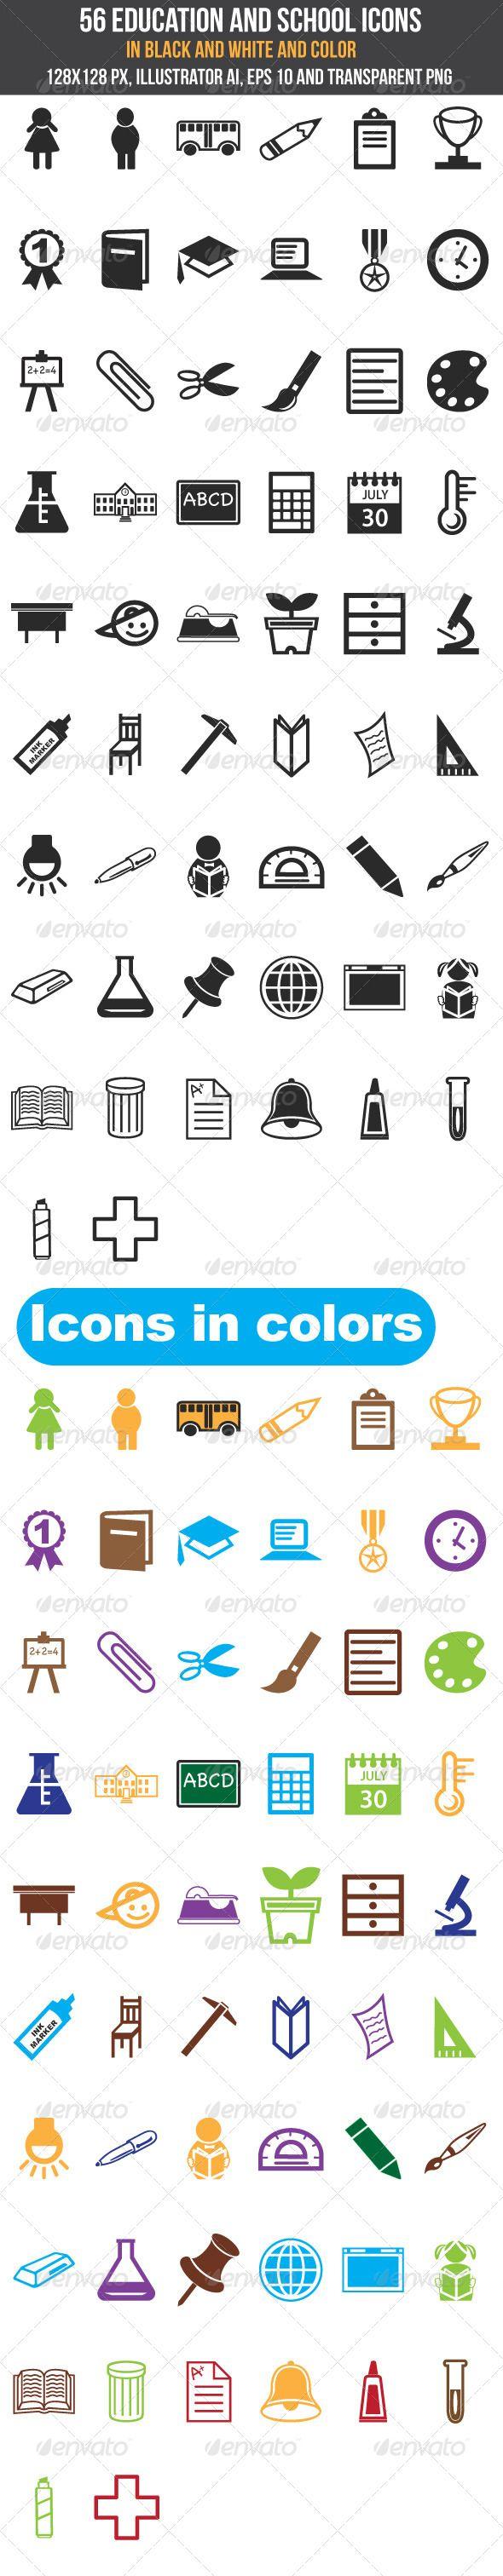 11 best Marktforschung & Co. images on Pinterest | Info graphics ...